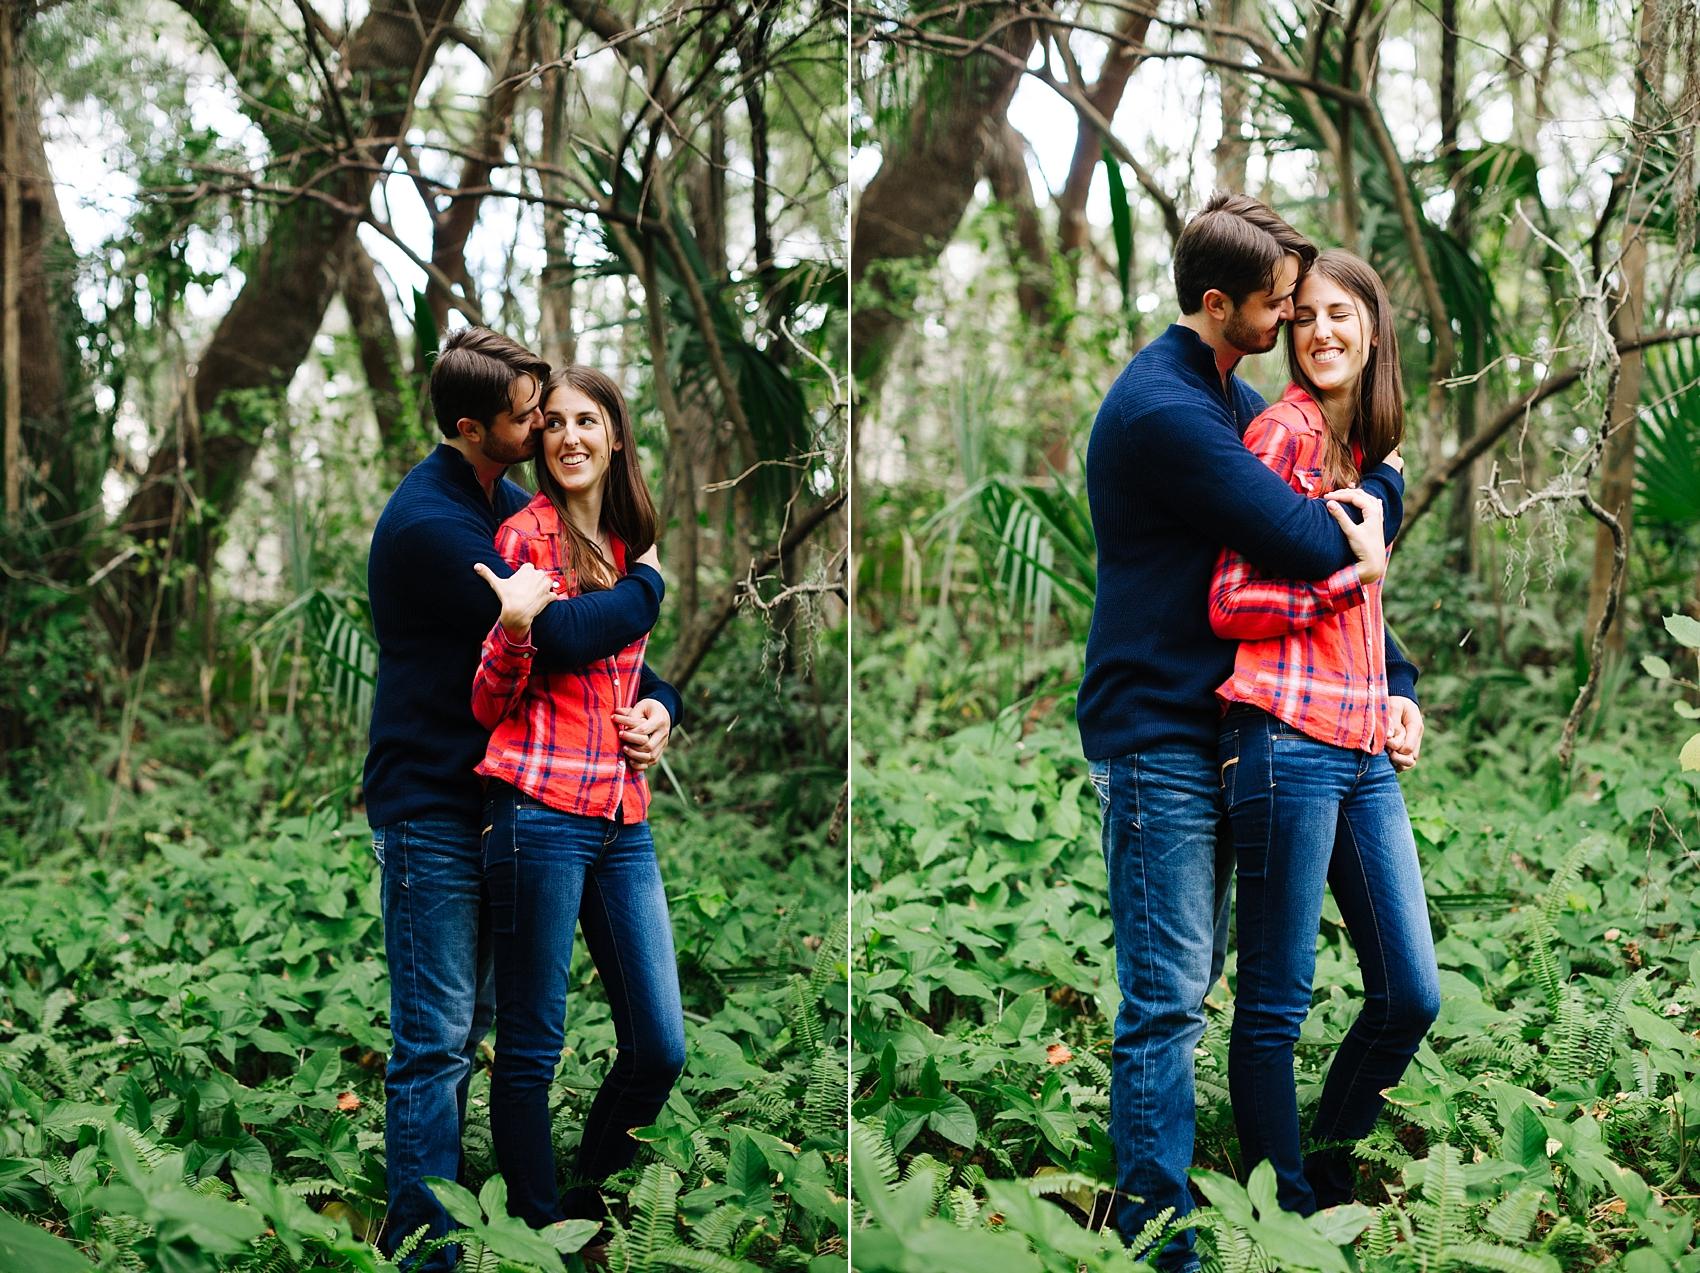 Jake & Katie Photography Seminole Heights Engagement Photos David & Cailyn-006.jpg